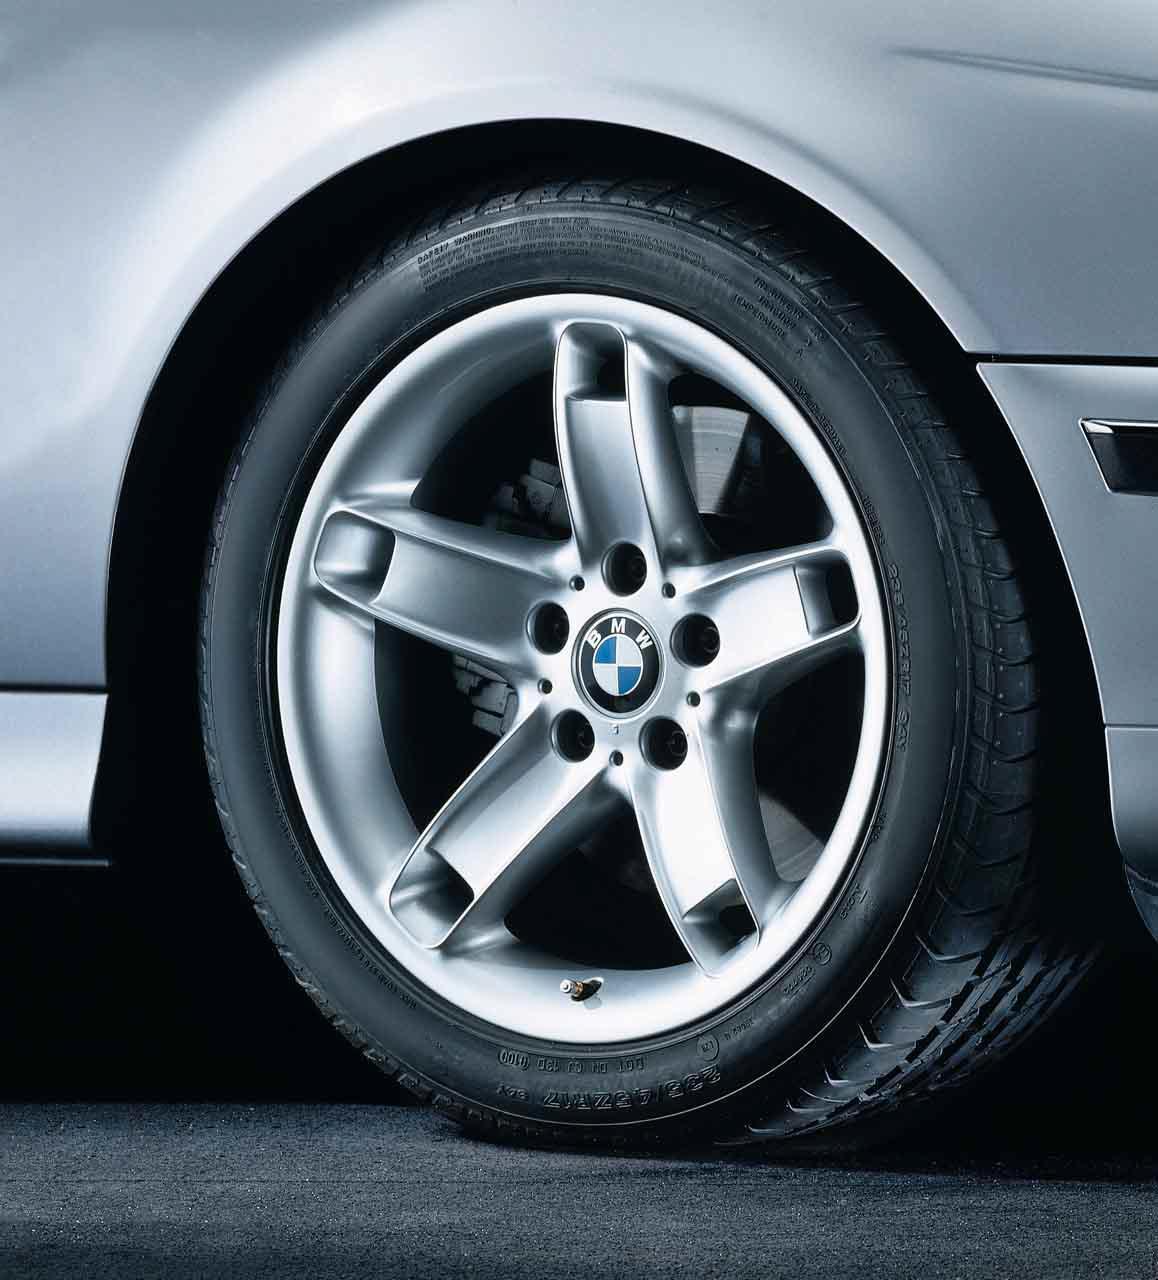 BMW Genuine Alloy Wheel 17 Star Spoke 49 Rim E39 5 Series 36111095442